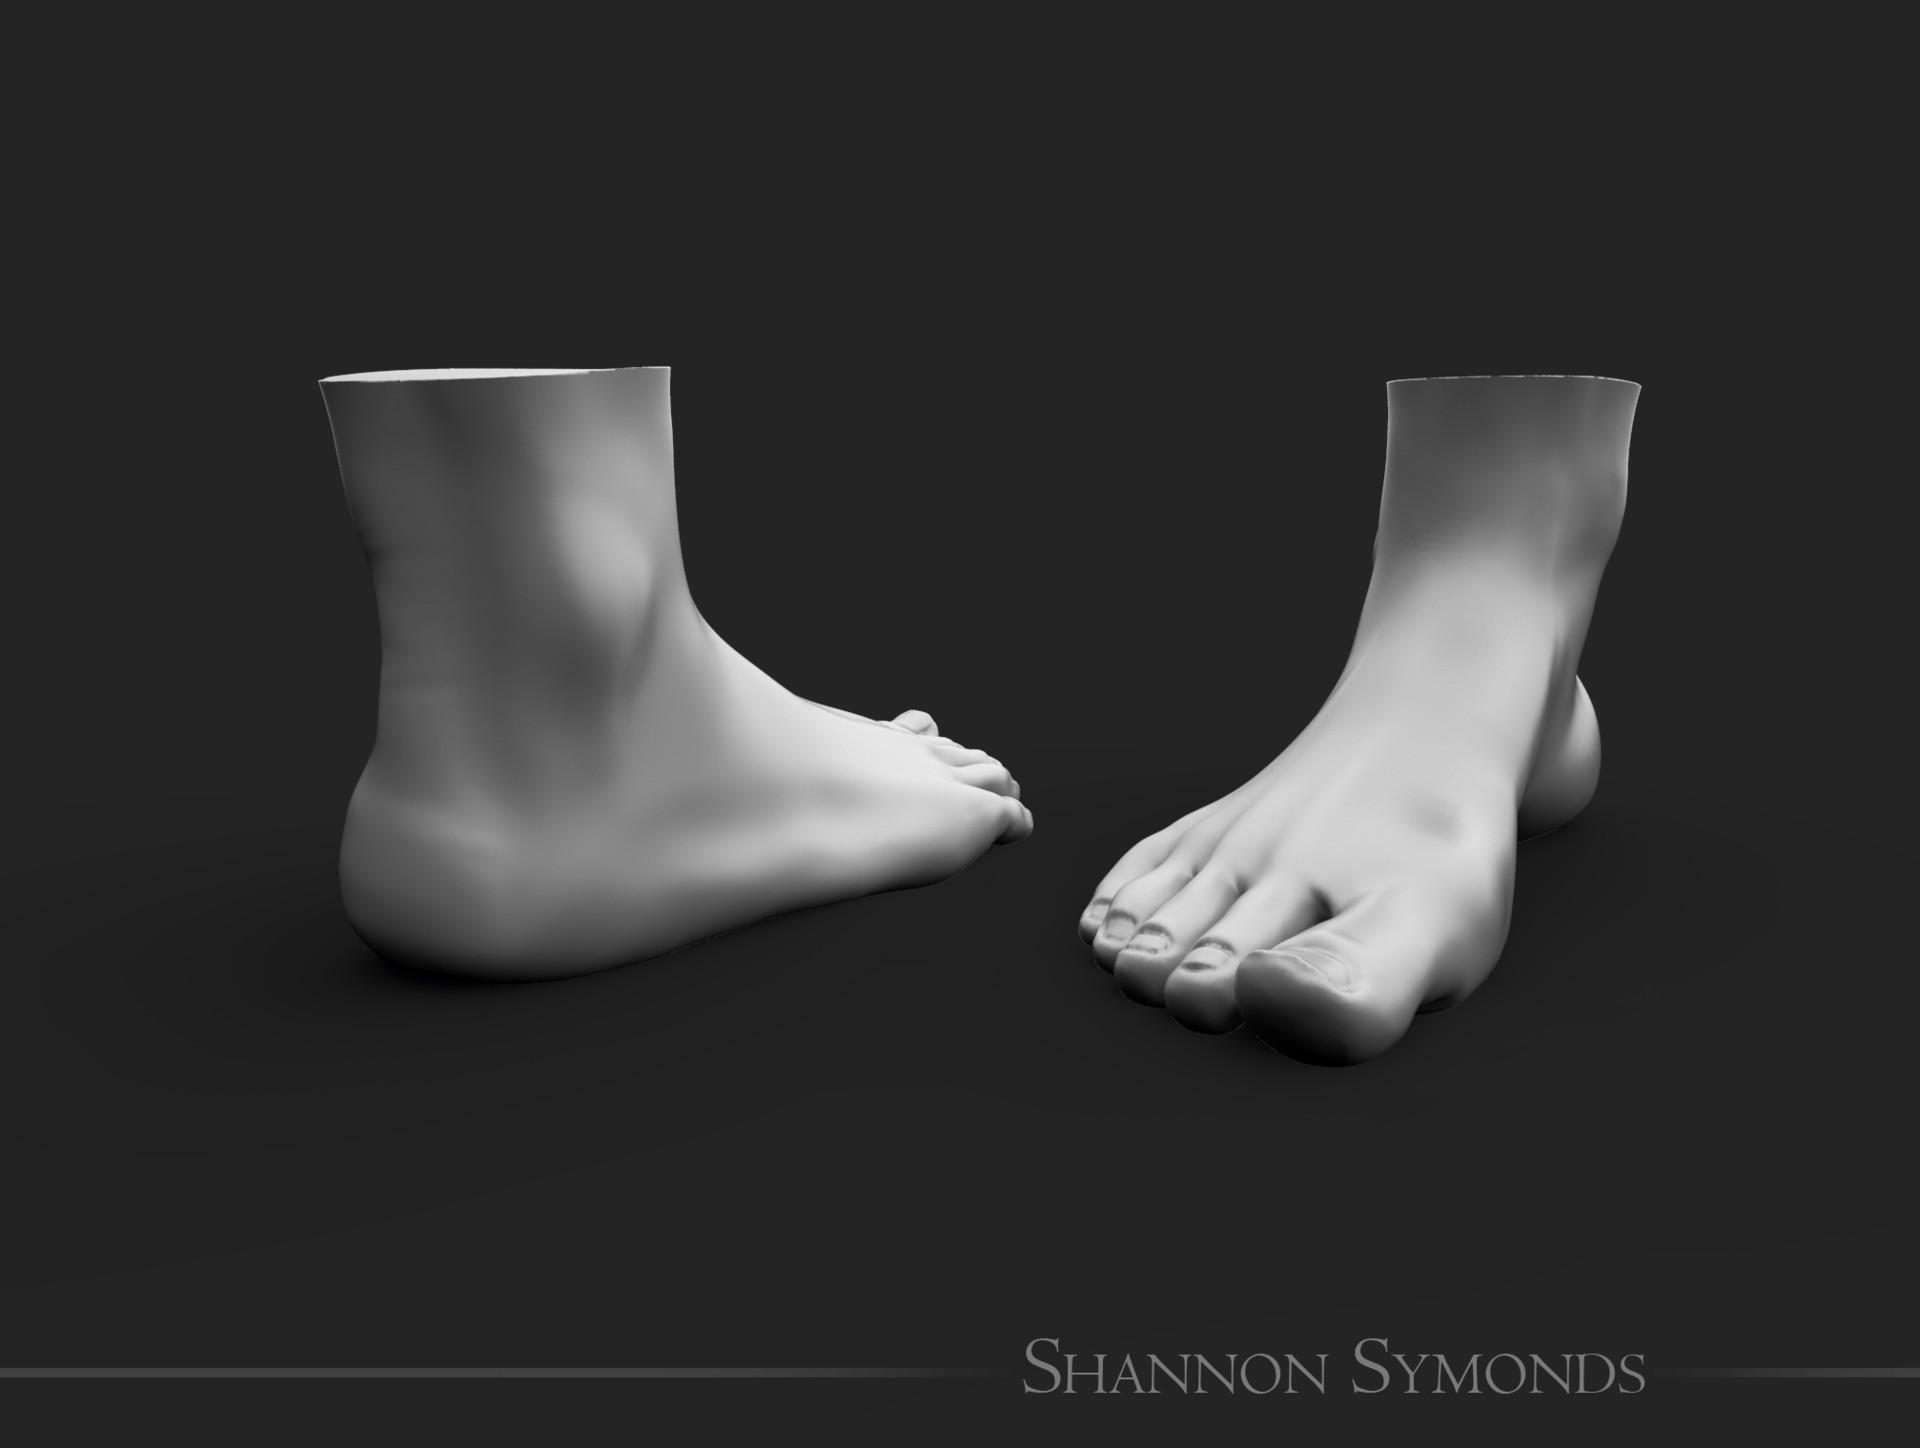 Shannon symonds foot unposed